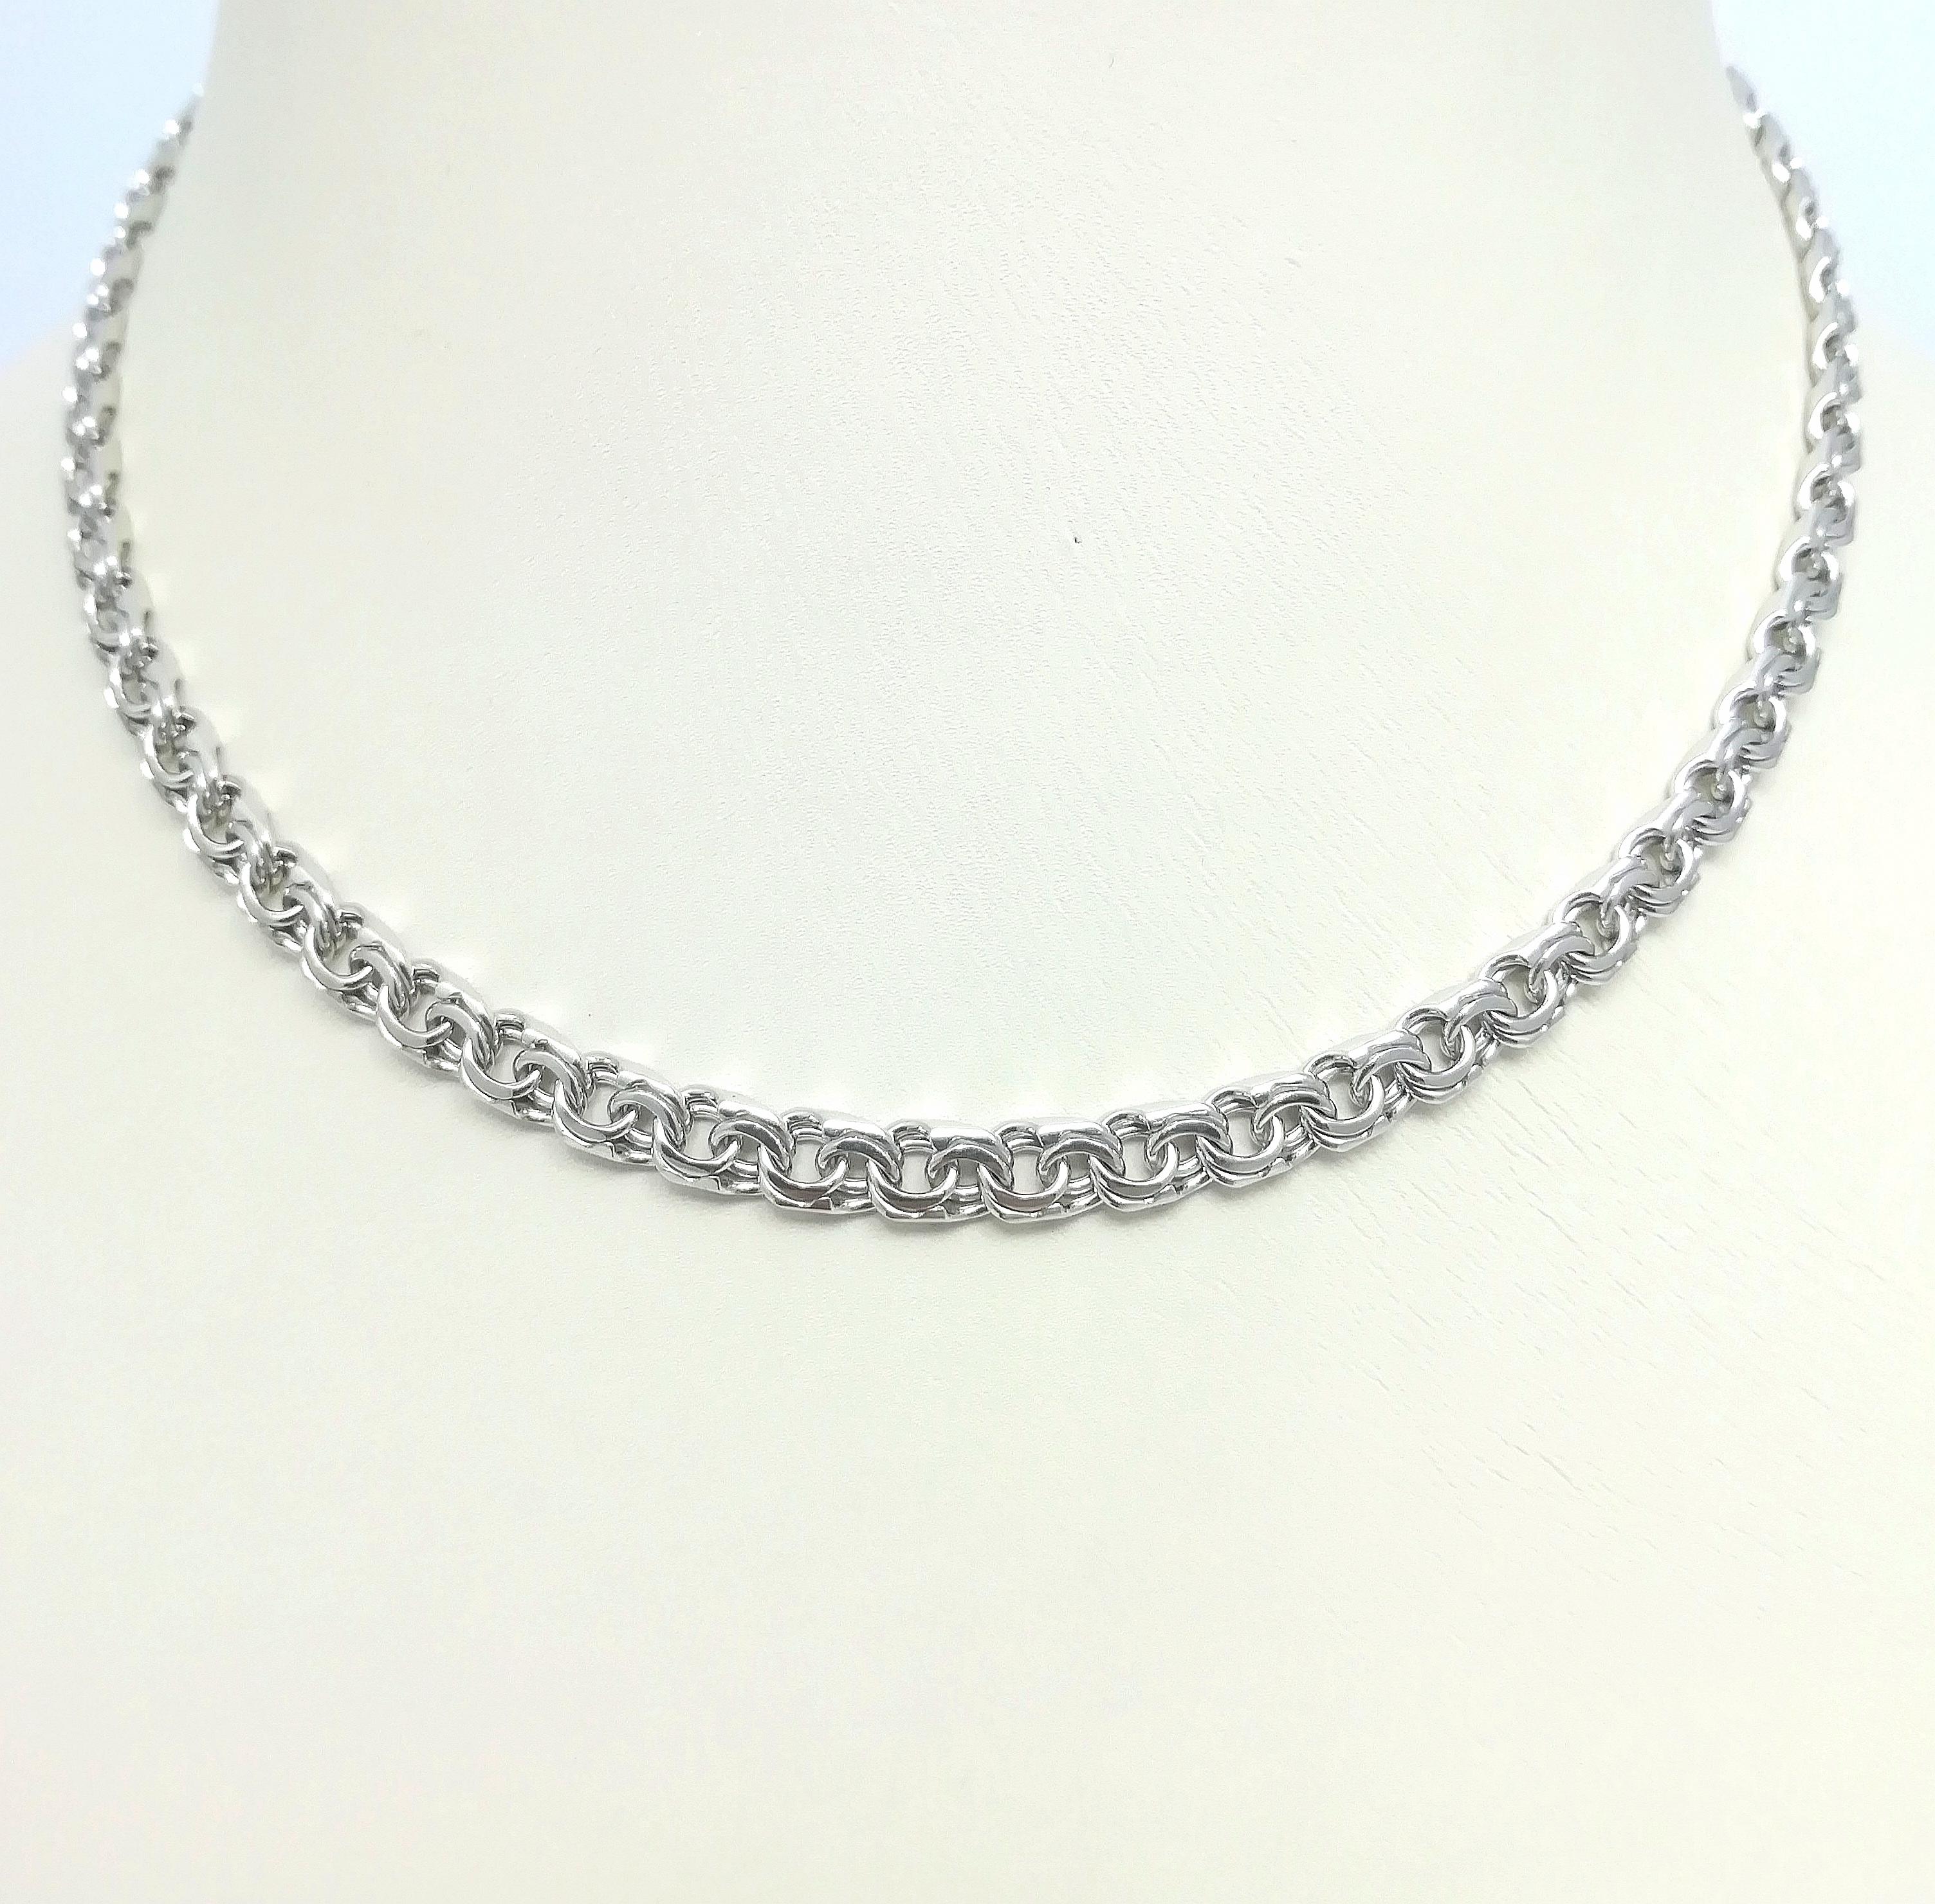 Серебро цепь дк240920-115 23,80гр